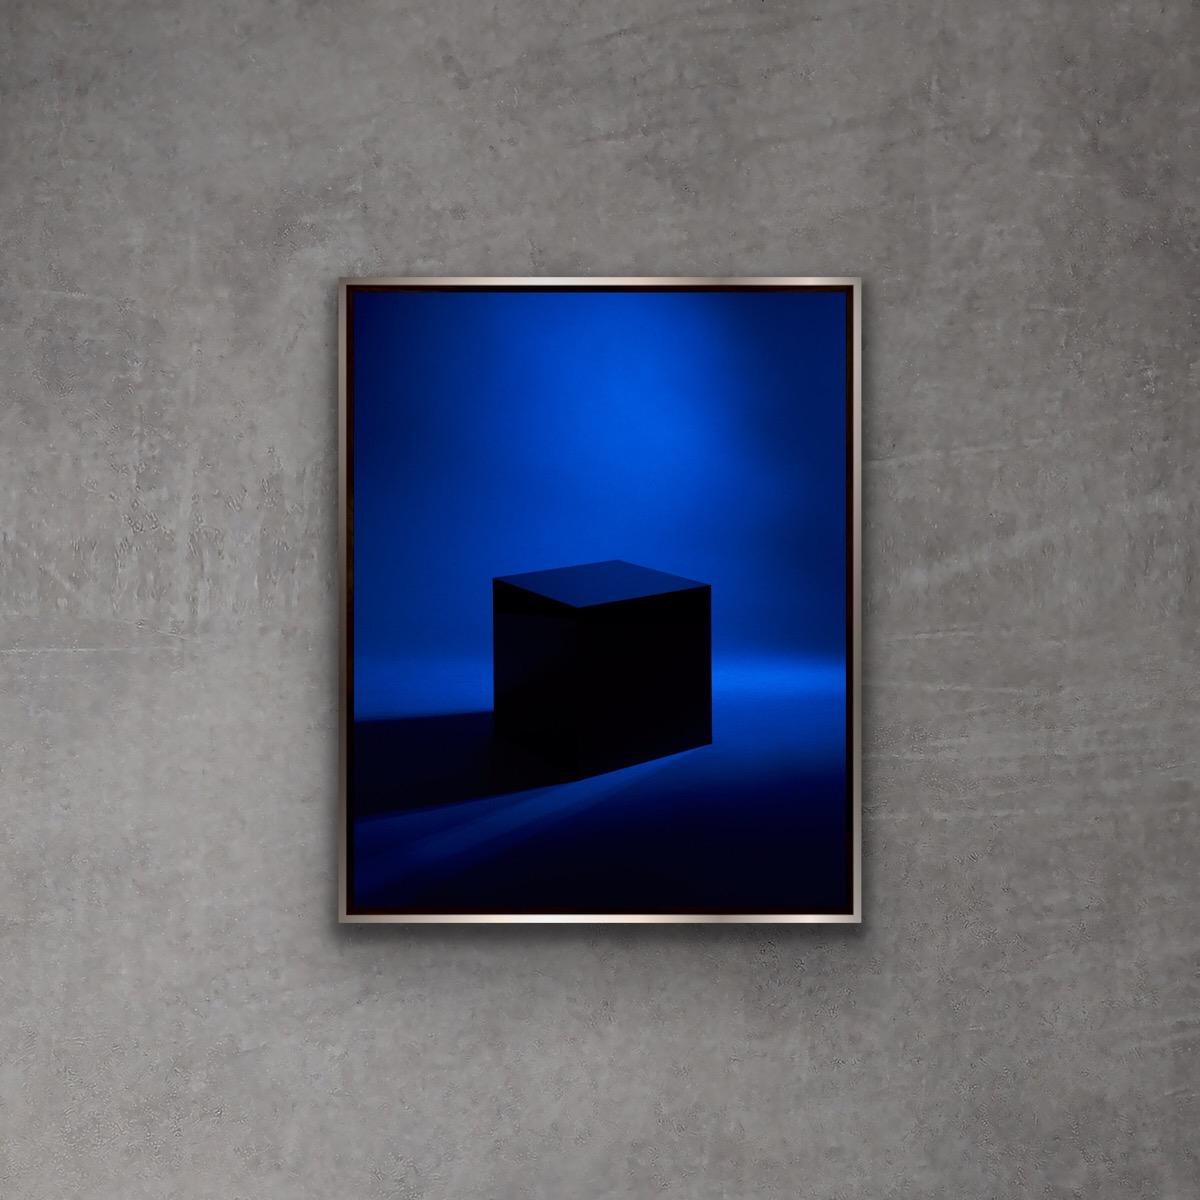 BLOCK by Grete Hjorth-Johansen, on a concrete wall